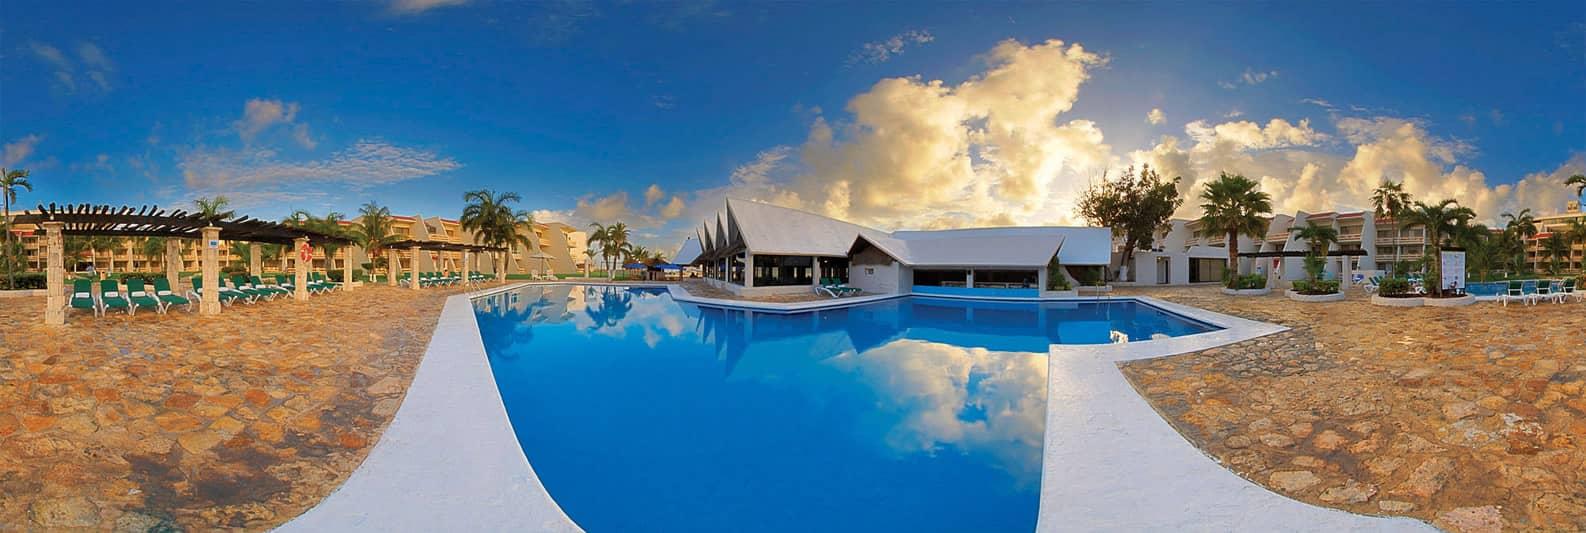 Ocean-Spa-Hotel